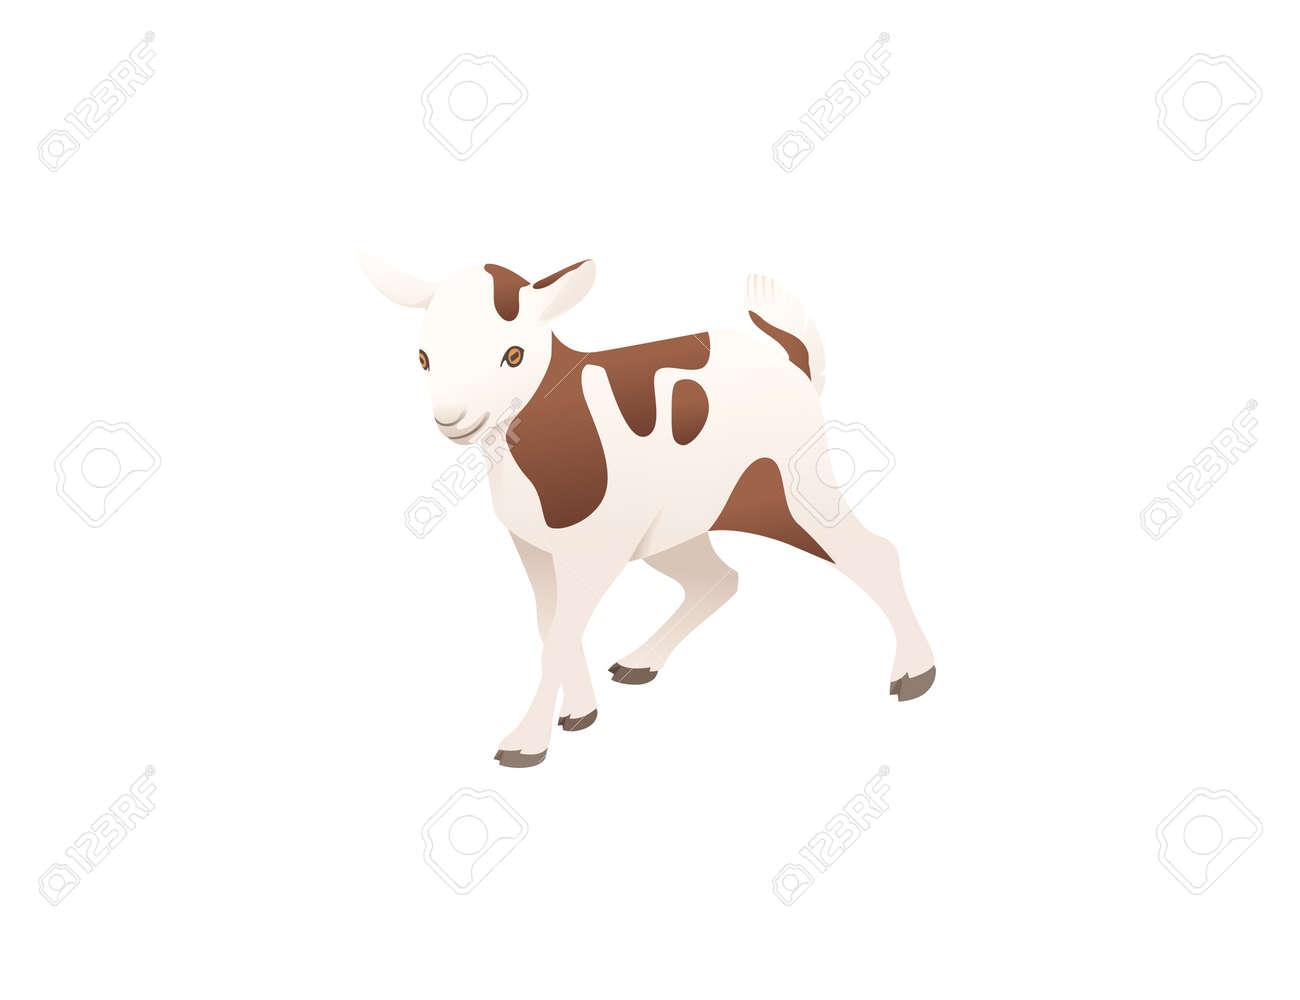 Cute adult white goat farm animal cartoon animal design vector illustration isolated on white background - 168754765